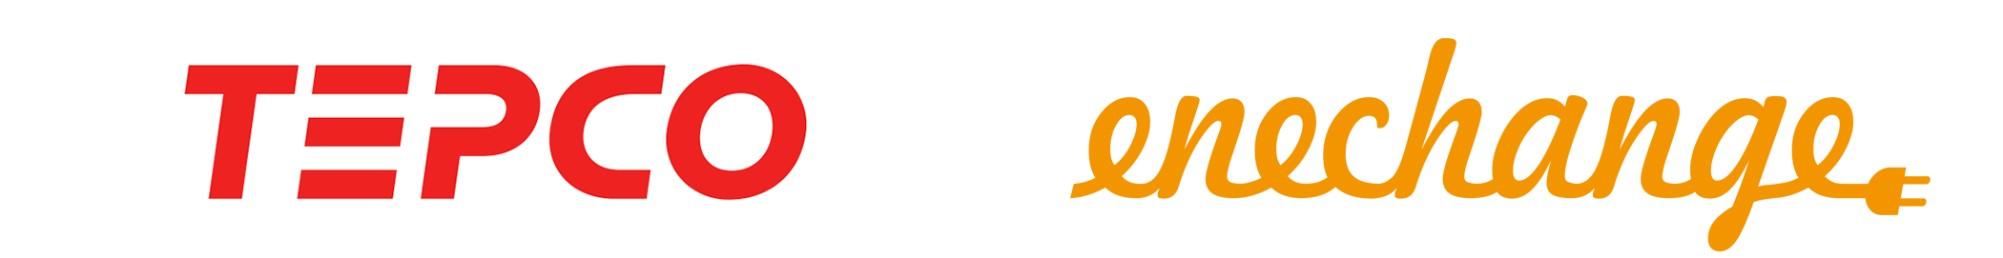 tepco_enechange_logo